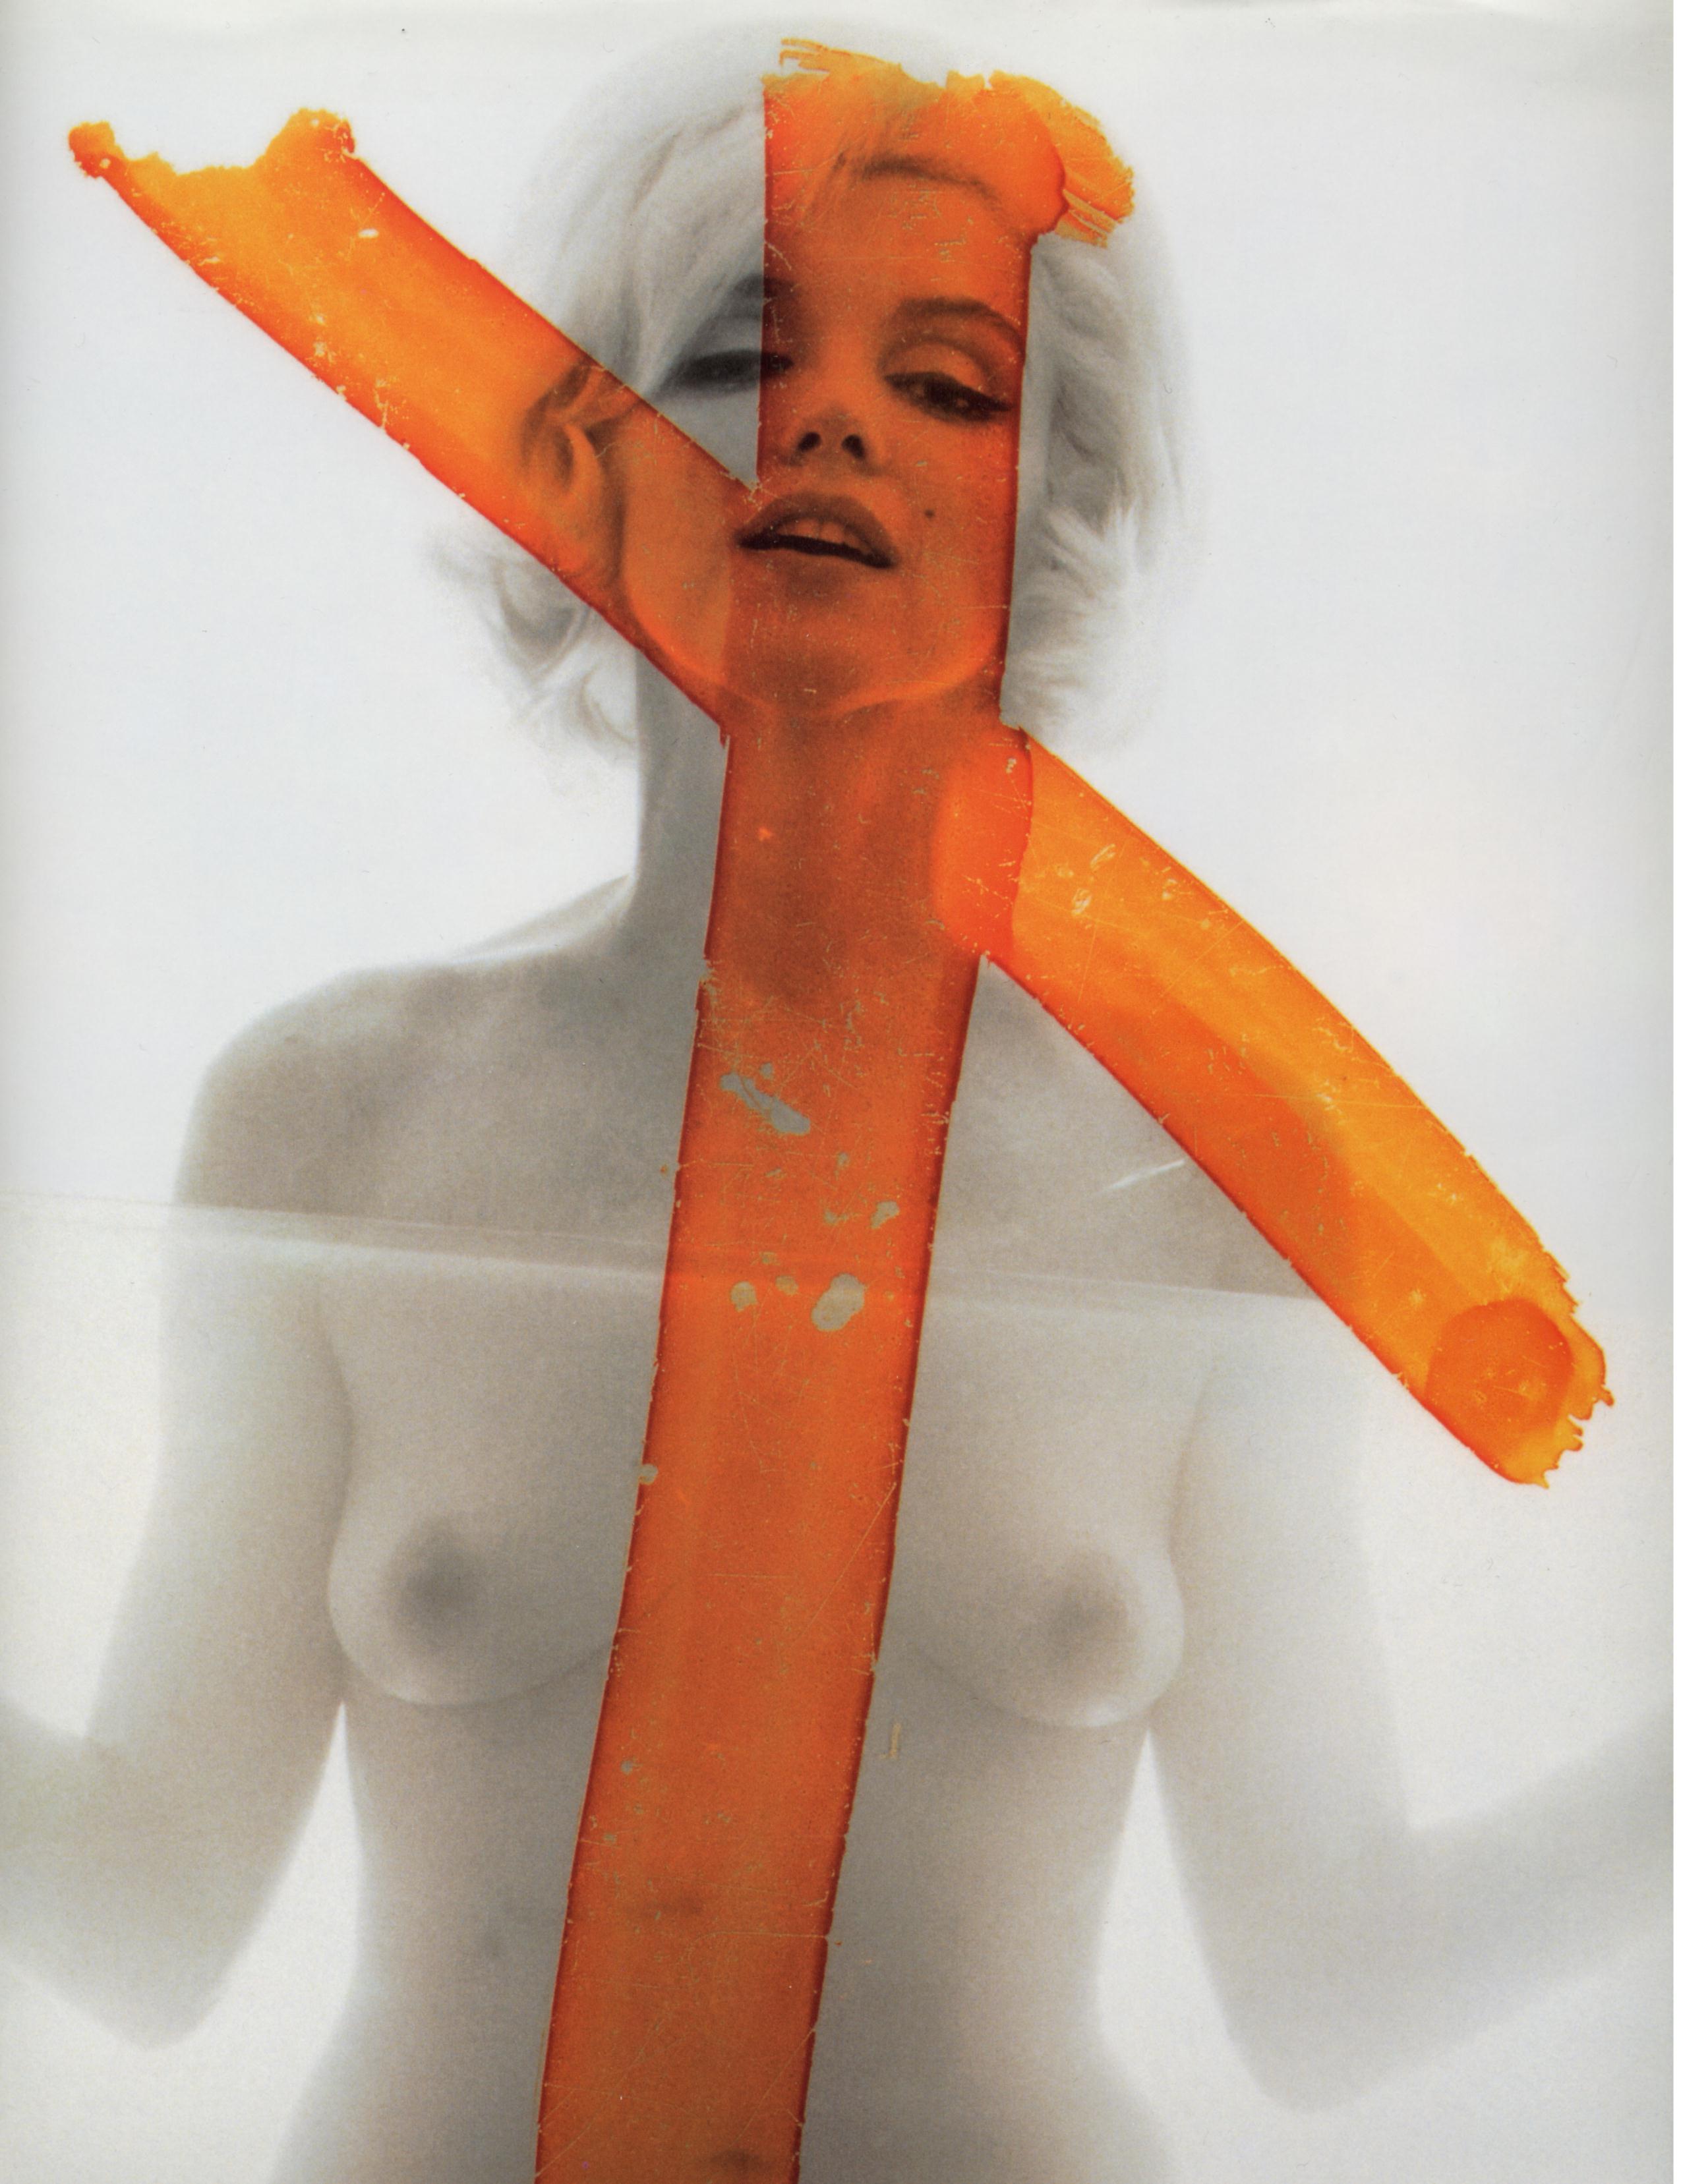 Marilyn Monroe nude 001 History of Art: Marilyn Monroe